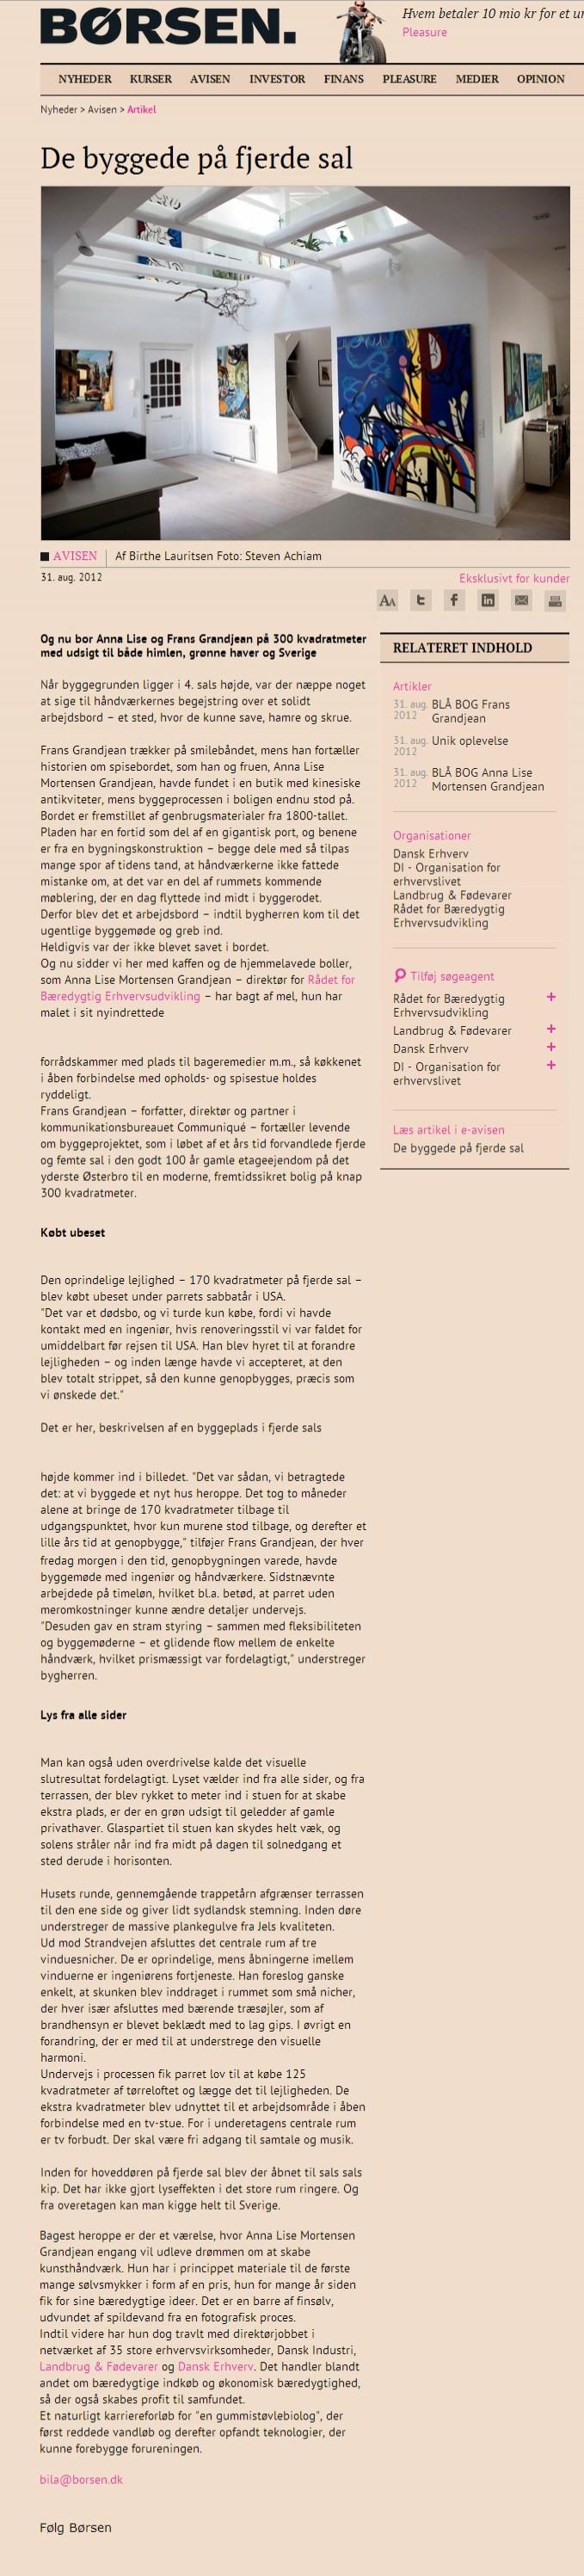 resizedimage6792995-Artikel-fra-brsen2